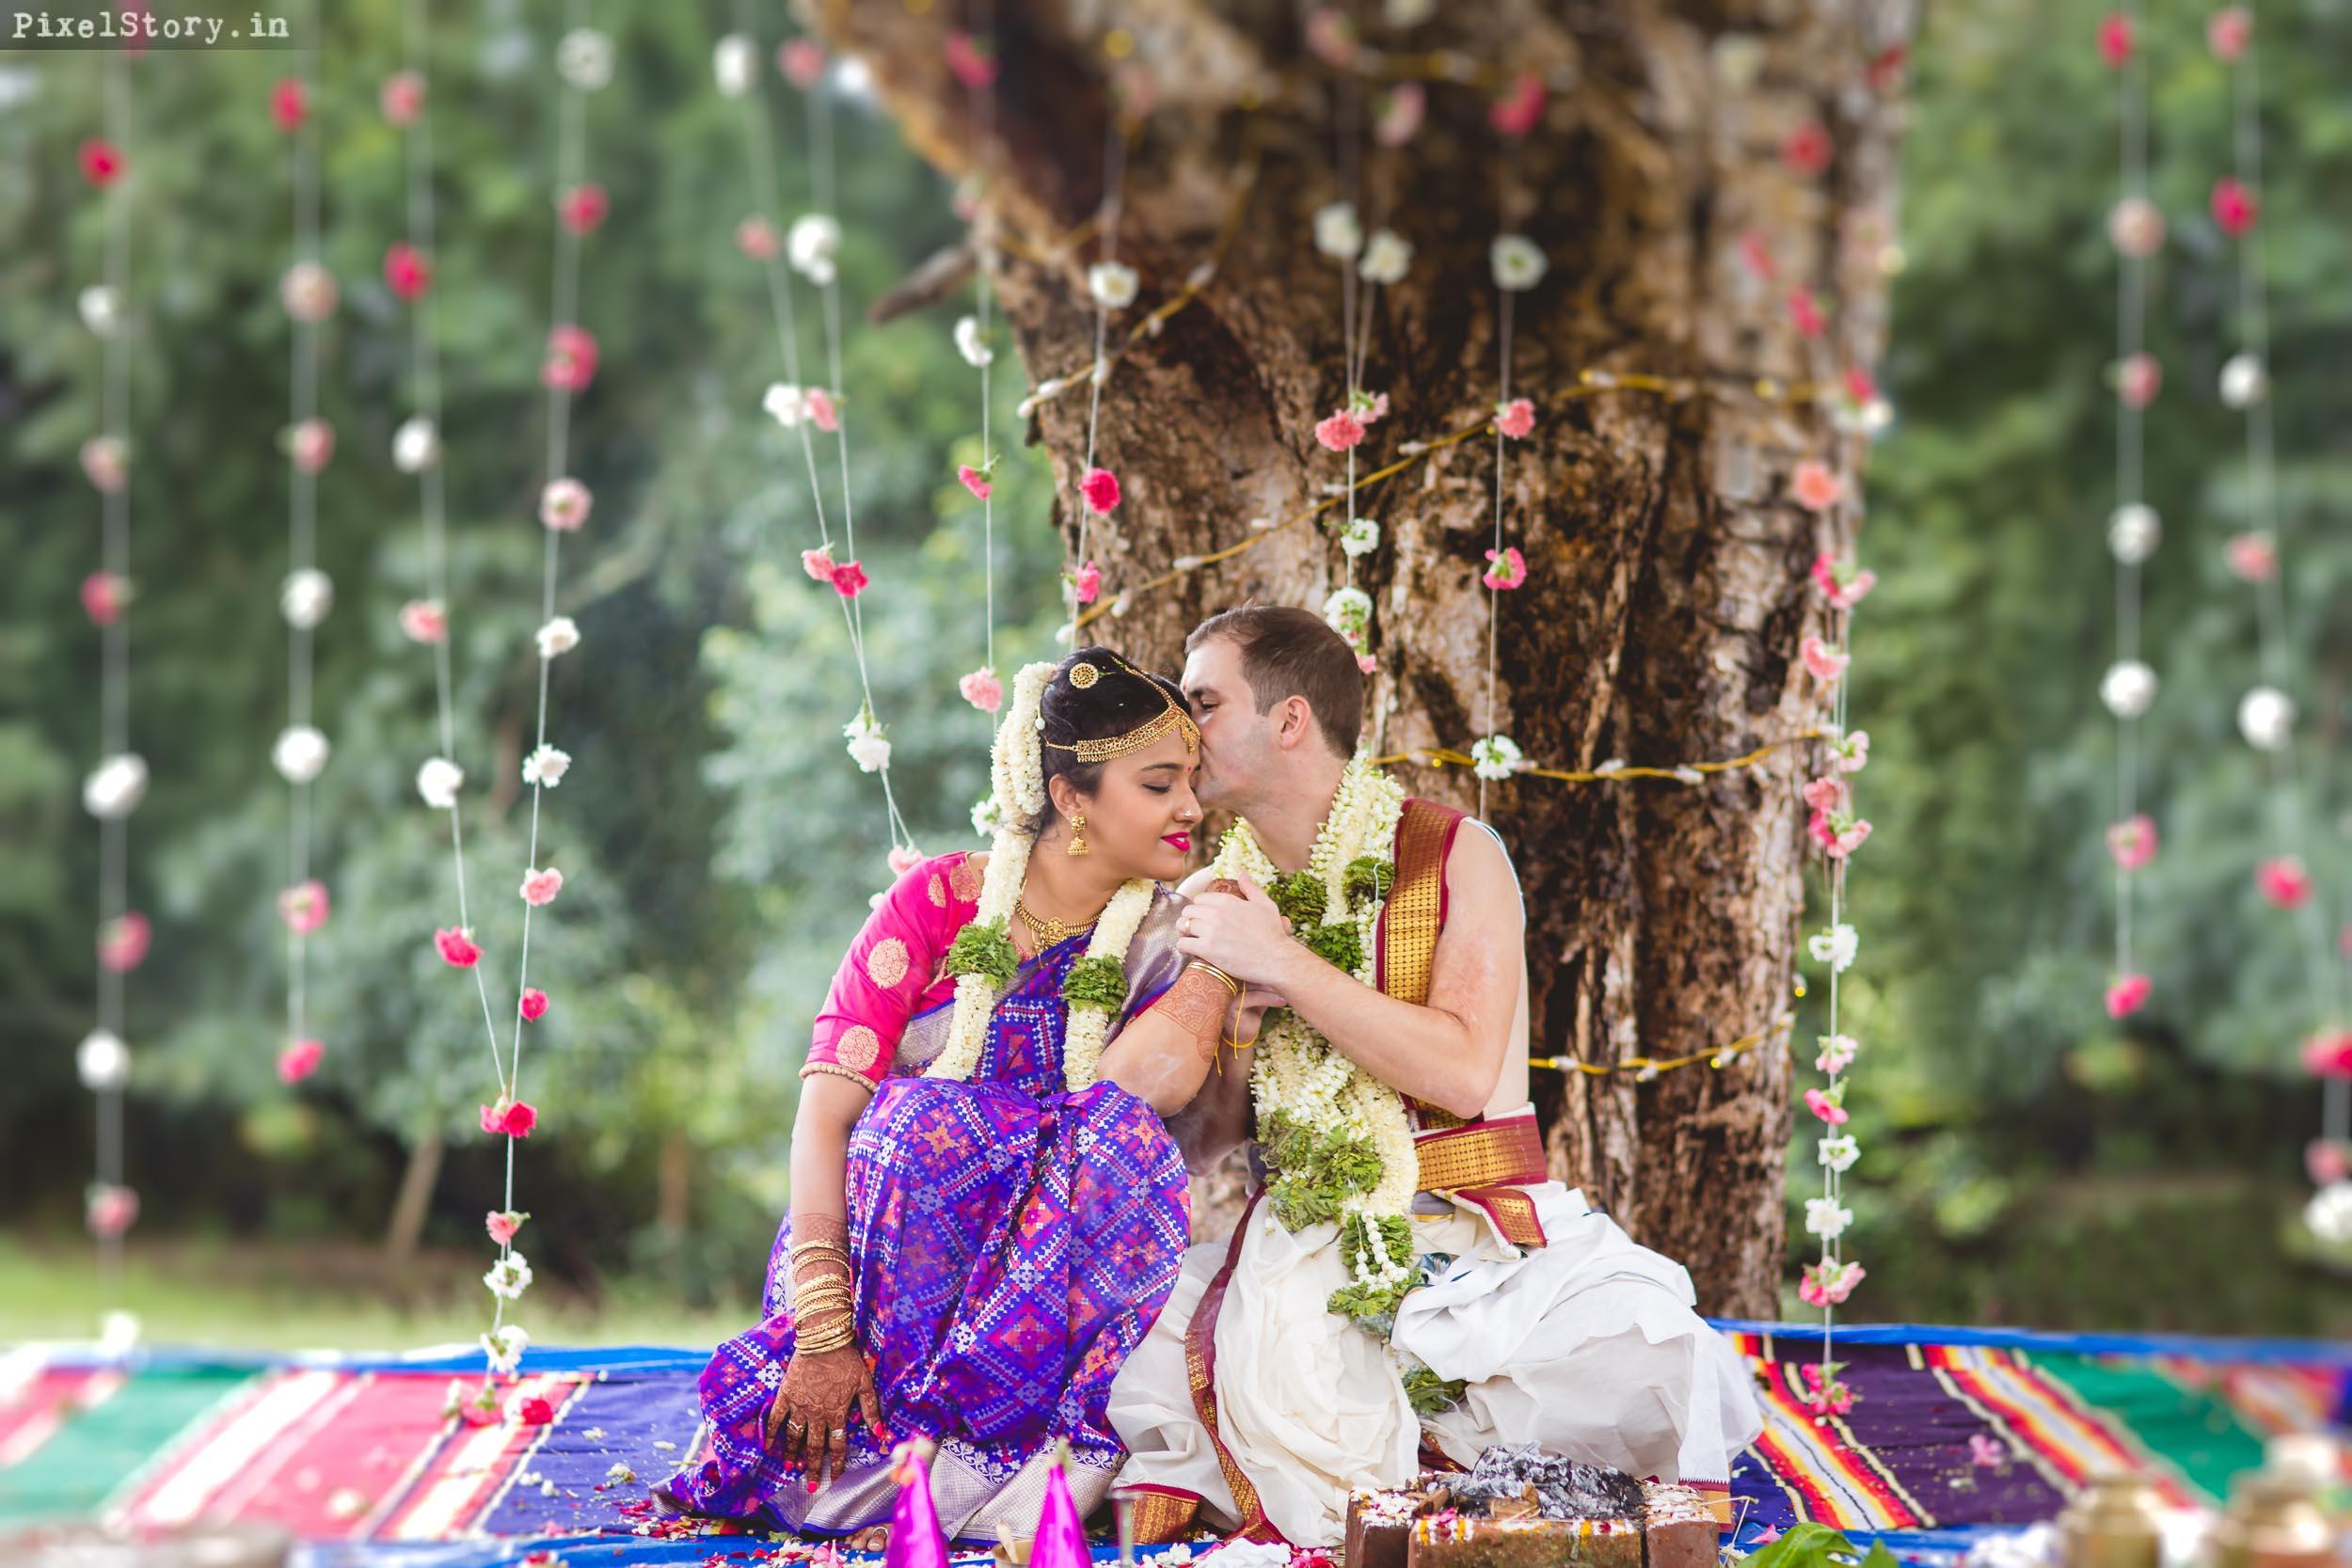 PixelStory-Jungle-Wedding-Photographer-Masinagudi-Indo-French080.jpg